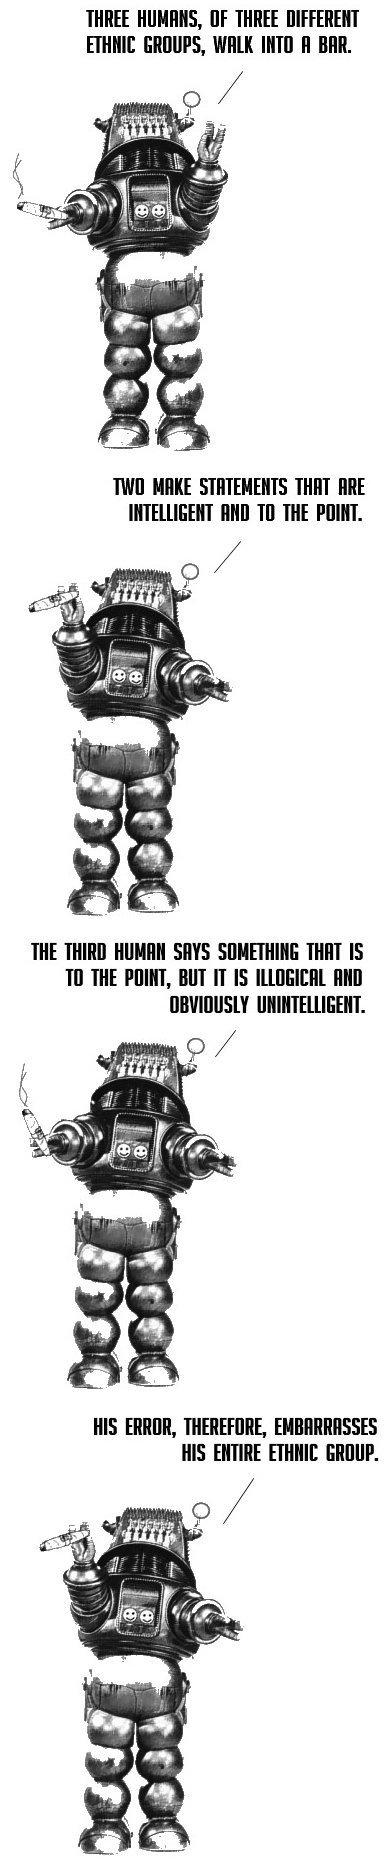 "Robot Puns. not oc, enjoy anyway. THREE , DE THREE |] Milt , WI] II Mill. FWD MIKE WIN ME HIE THIN] SETS THIN tli TI] THE HINT, BIN II IS wll[ HEII'. Iil III""!  Robot"